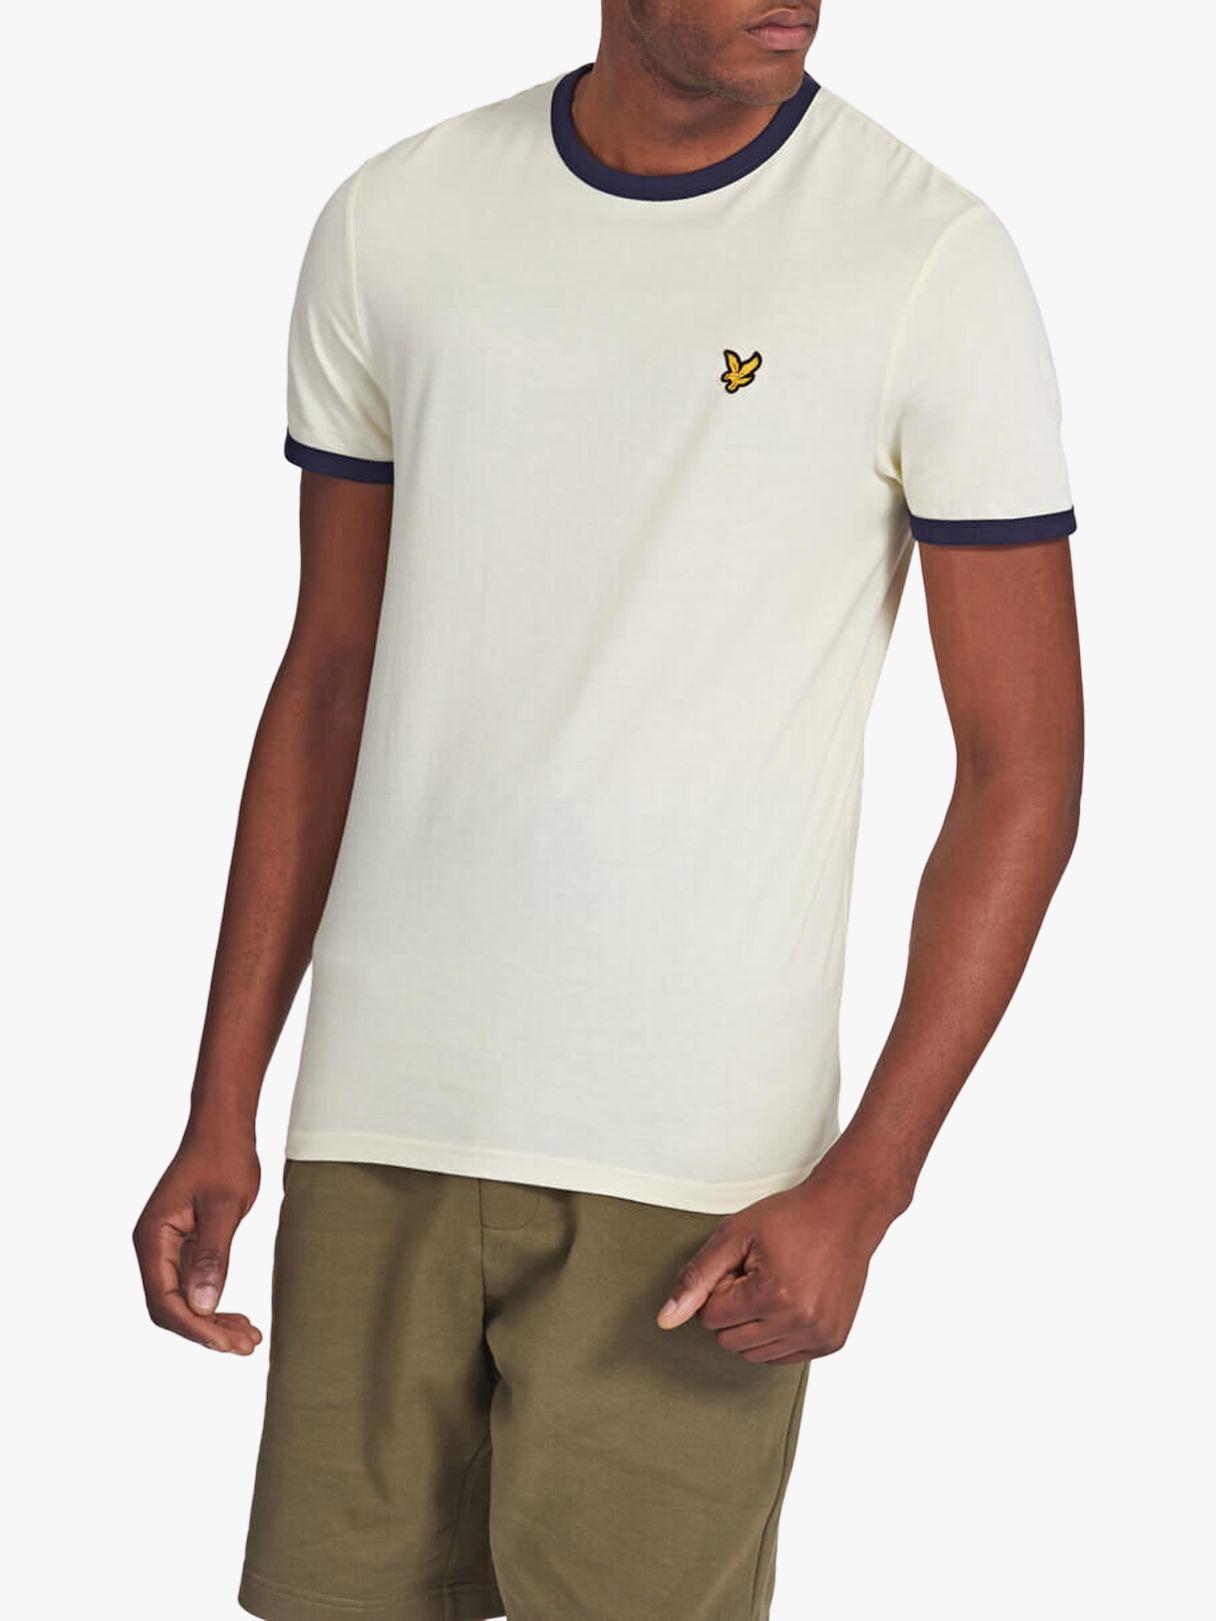 Lyle & Scott Lyle & Scott Ringer Crew Neck T-Shirt, White/Navy